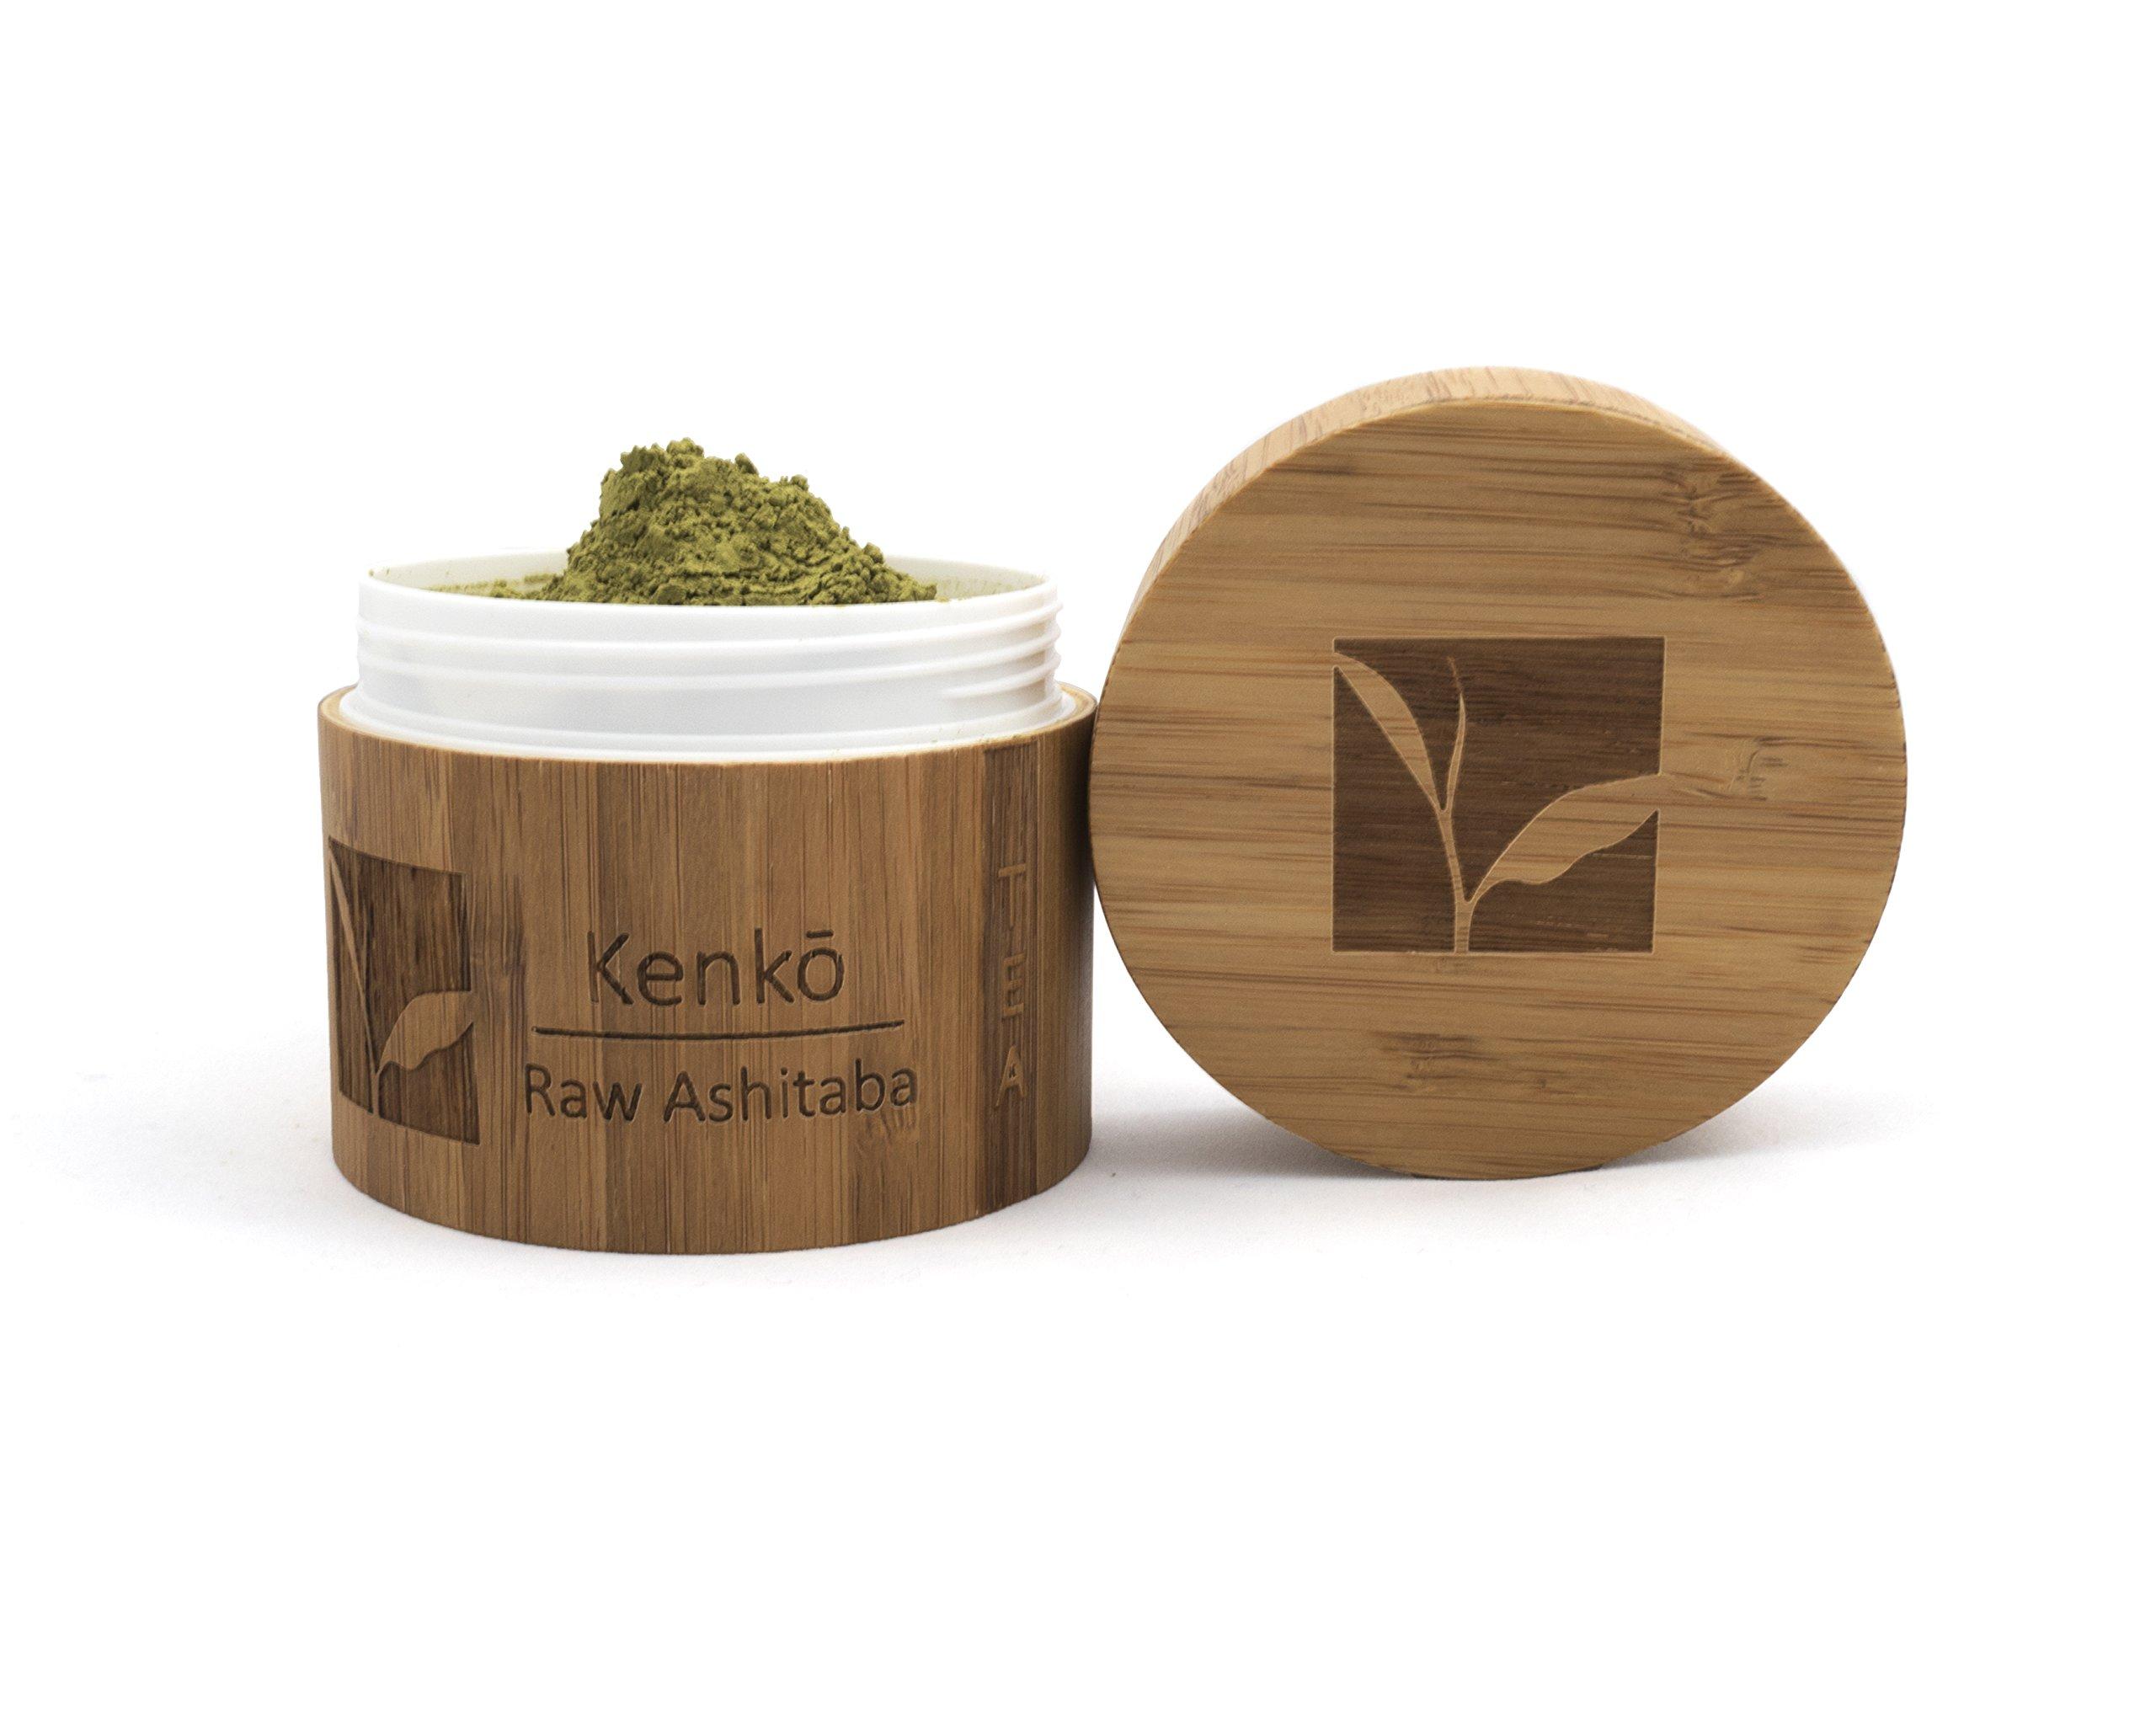 Kenkō Raw Ashitaba Tea